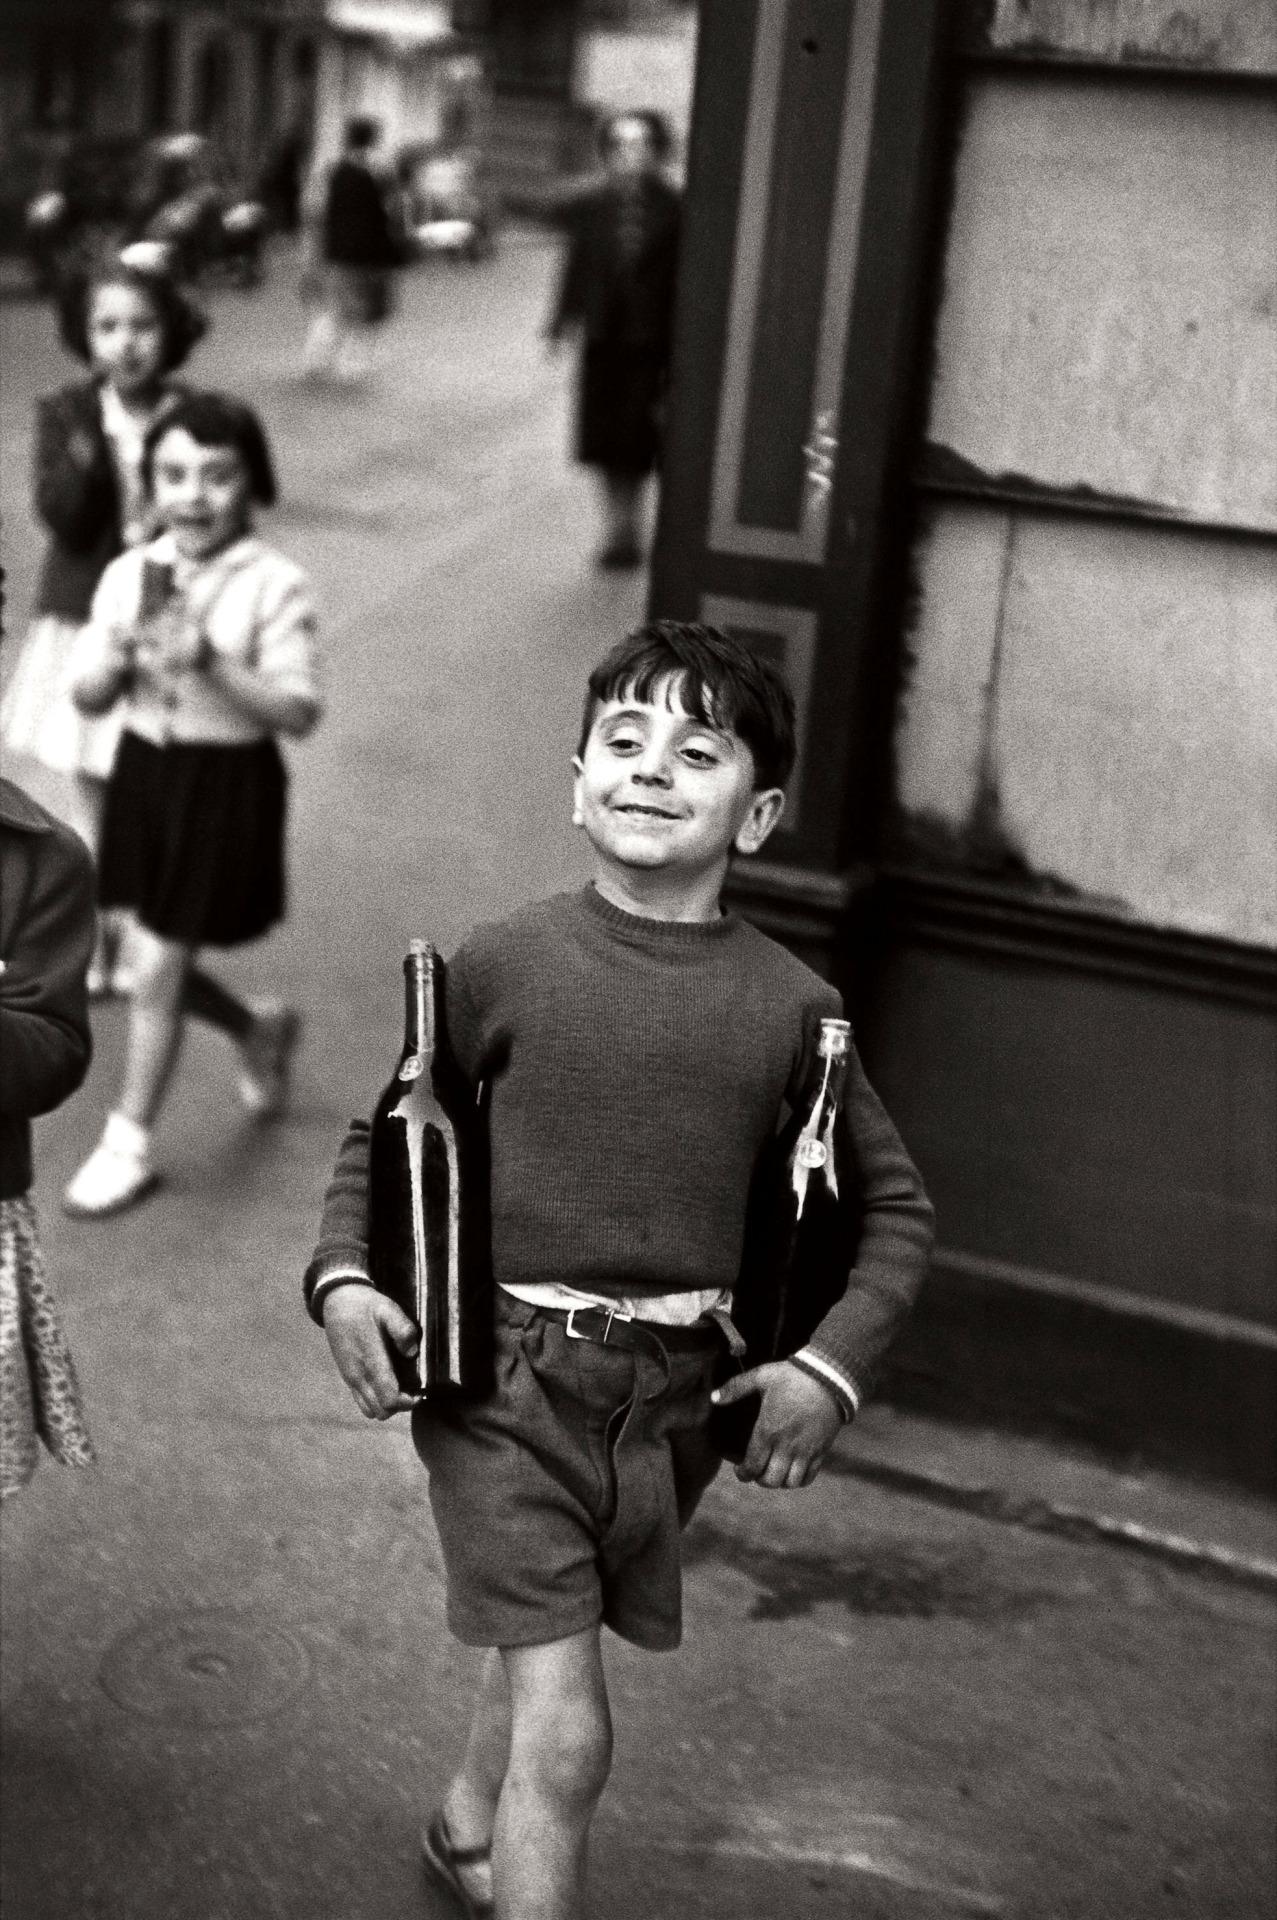 Henri Cartier Bresson, Child holding two bottles of wine. Rue mouffetard